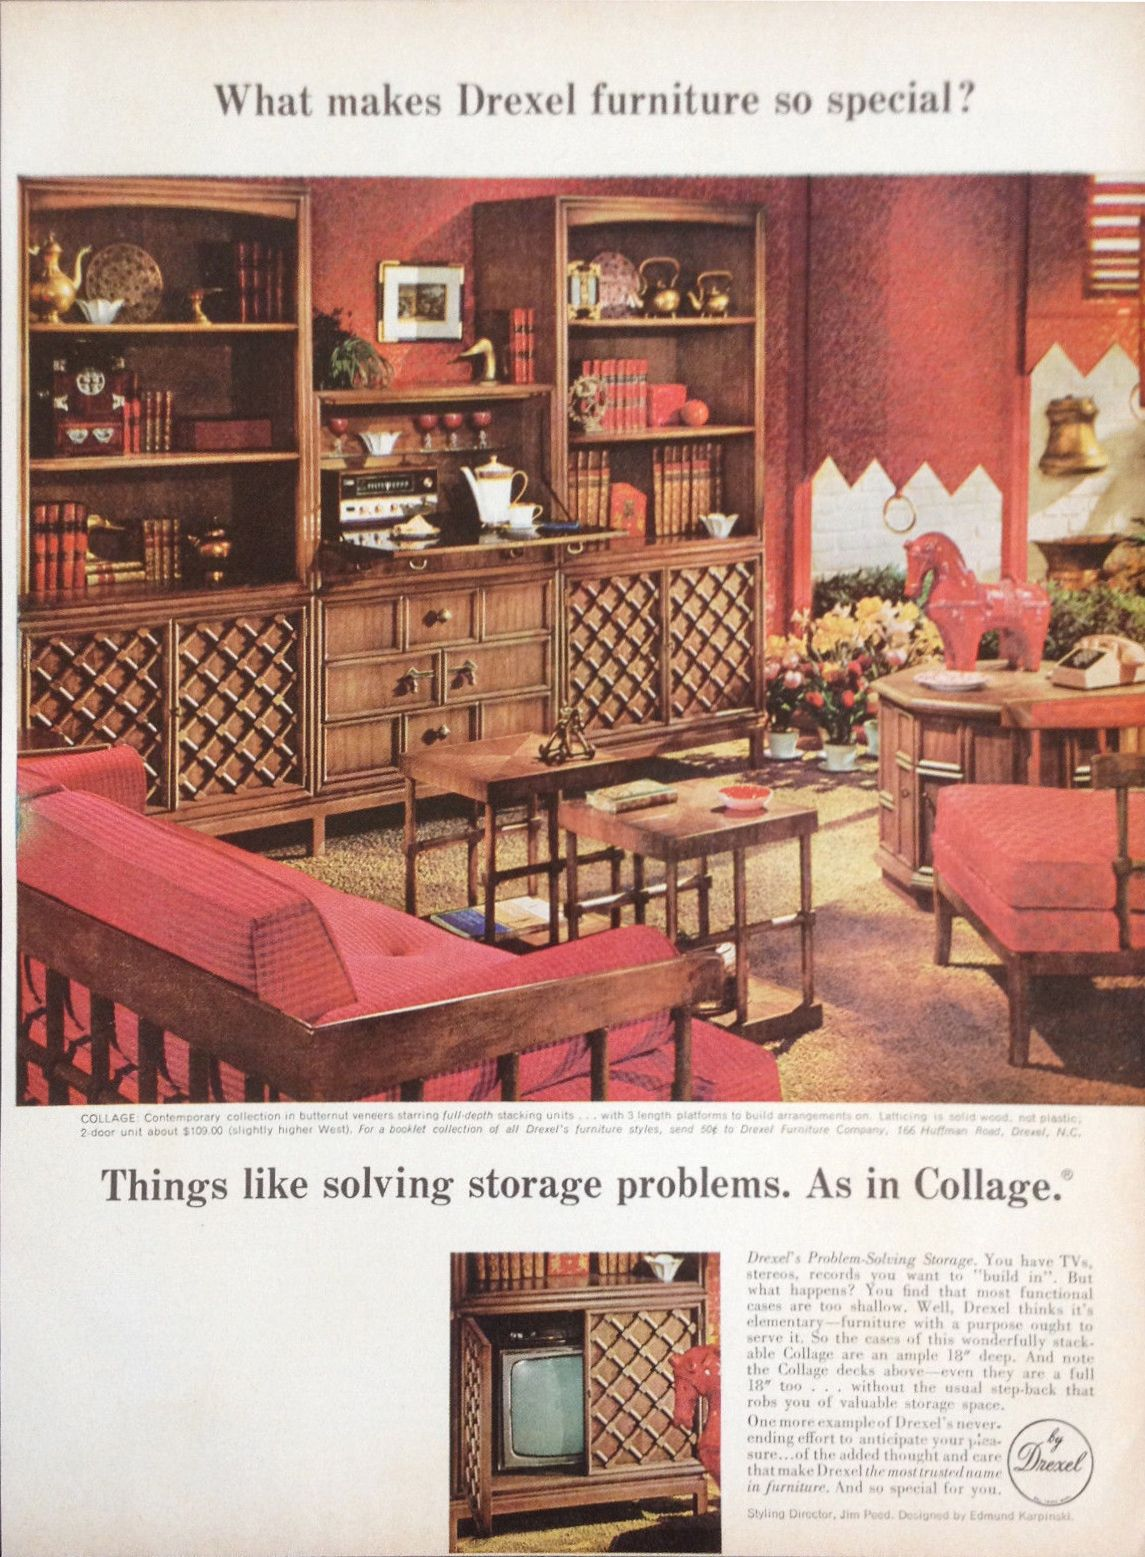 Drexel 1967 Collage - Drexel 1967 Collage MCM Drexel Furniture Pinterest 1960s